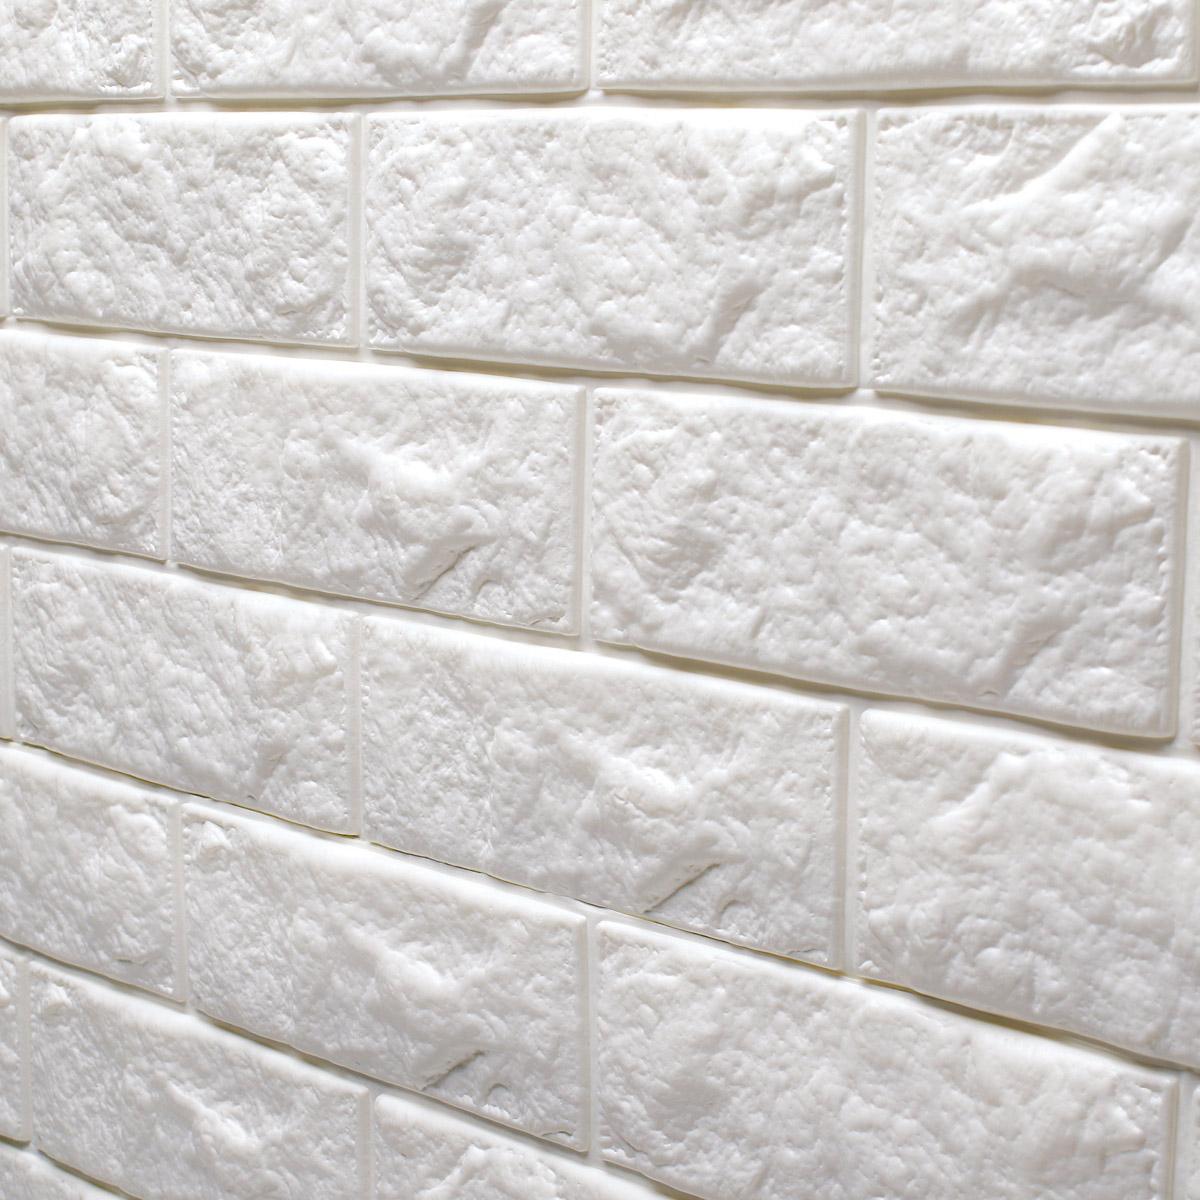 Brick Design Wall Covering : Peel stick d wall panels foam block brick design